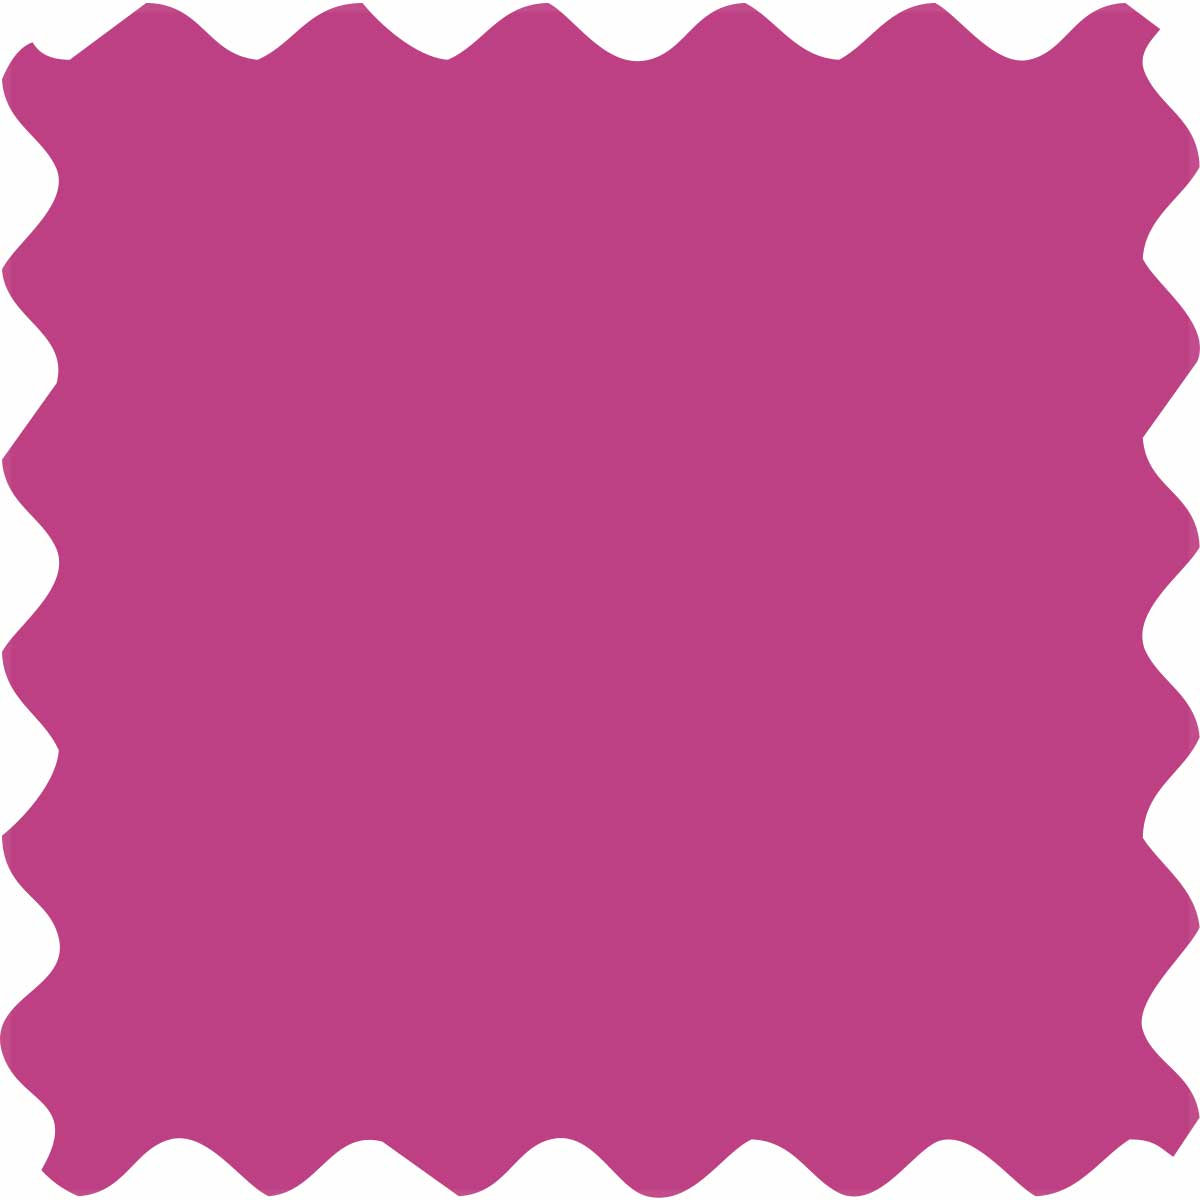 Fabric Creations™ Plush™ 3-D Fabric Paints - Sugar Plum, 2 oz.